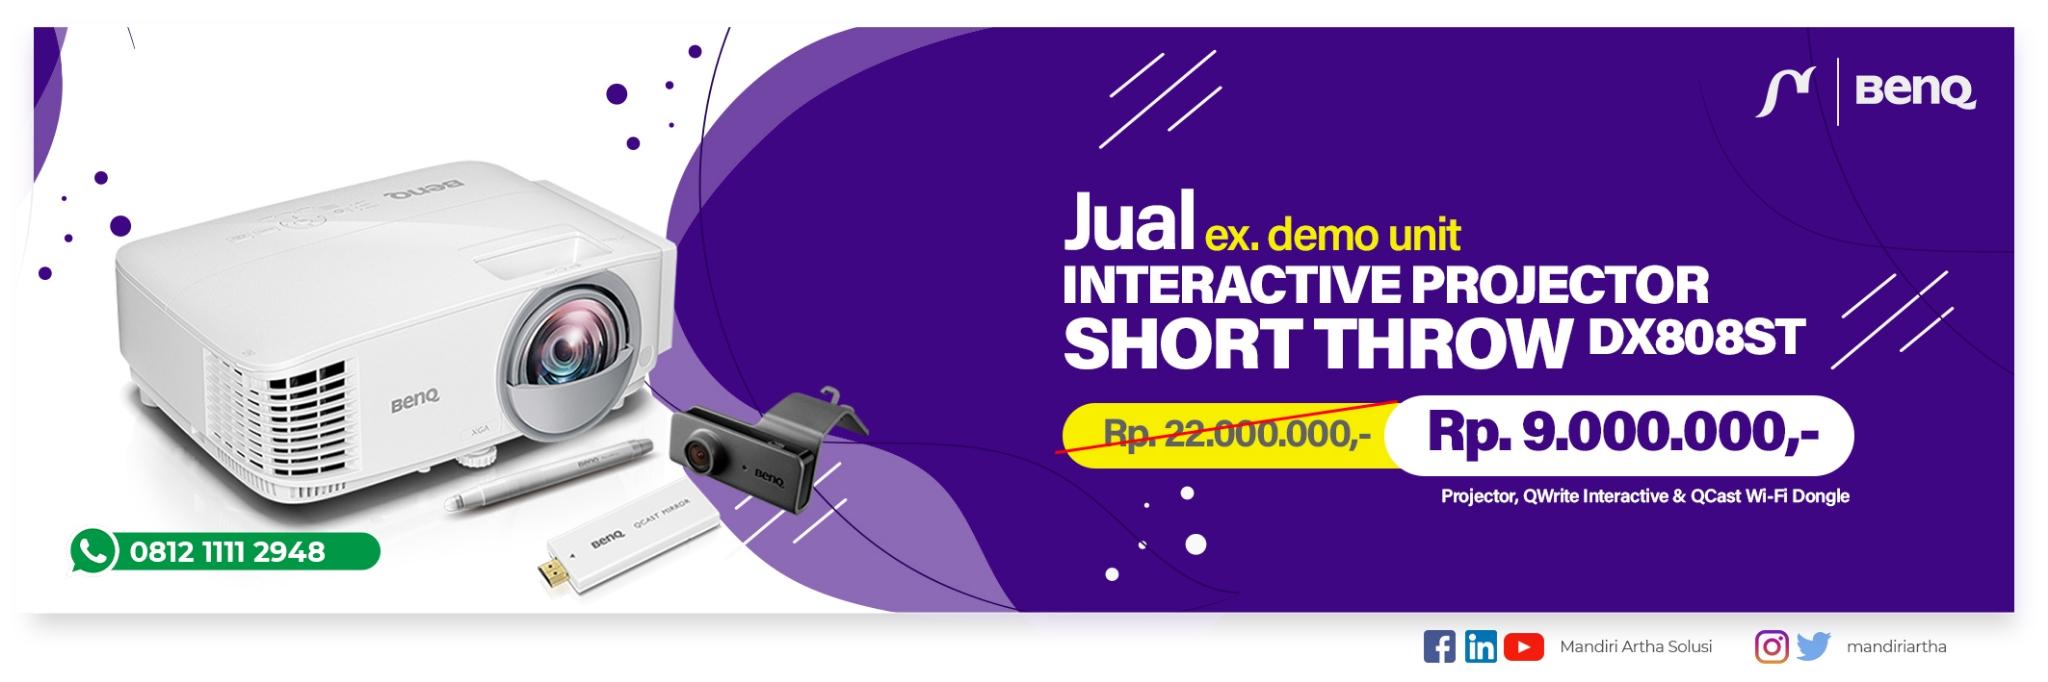 jual interactive projector benq dx808st